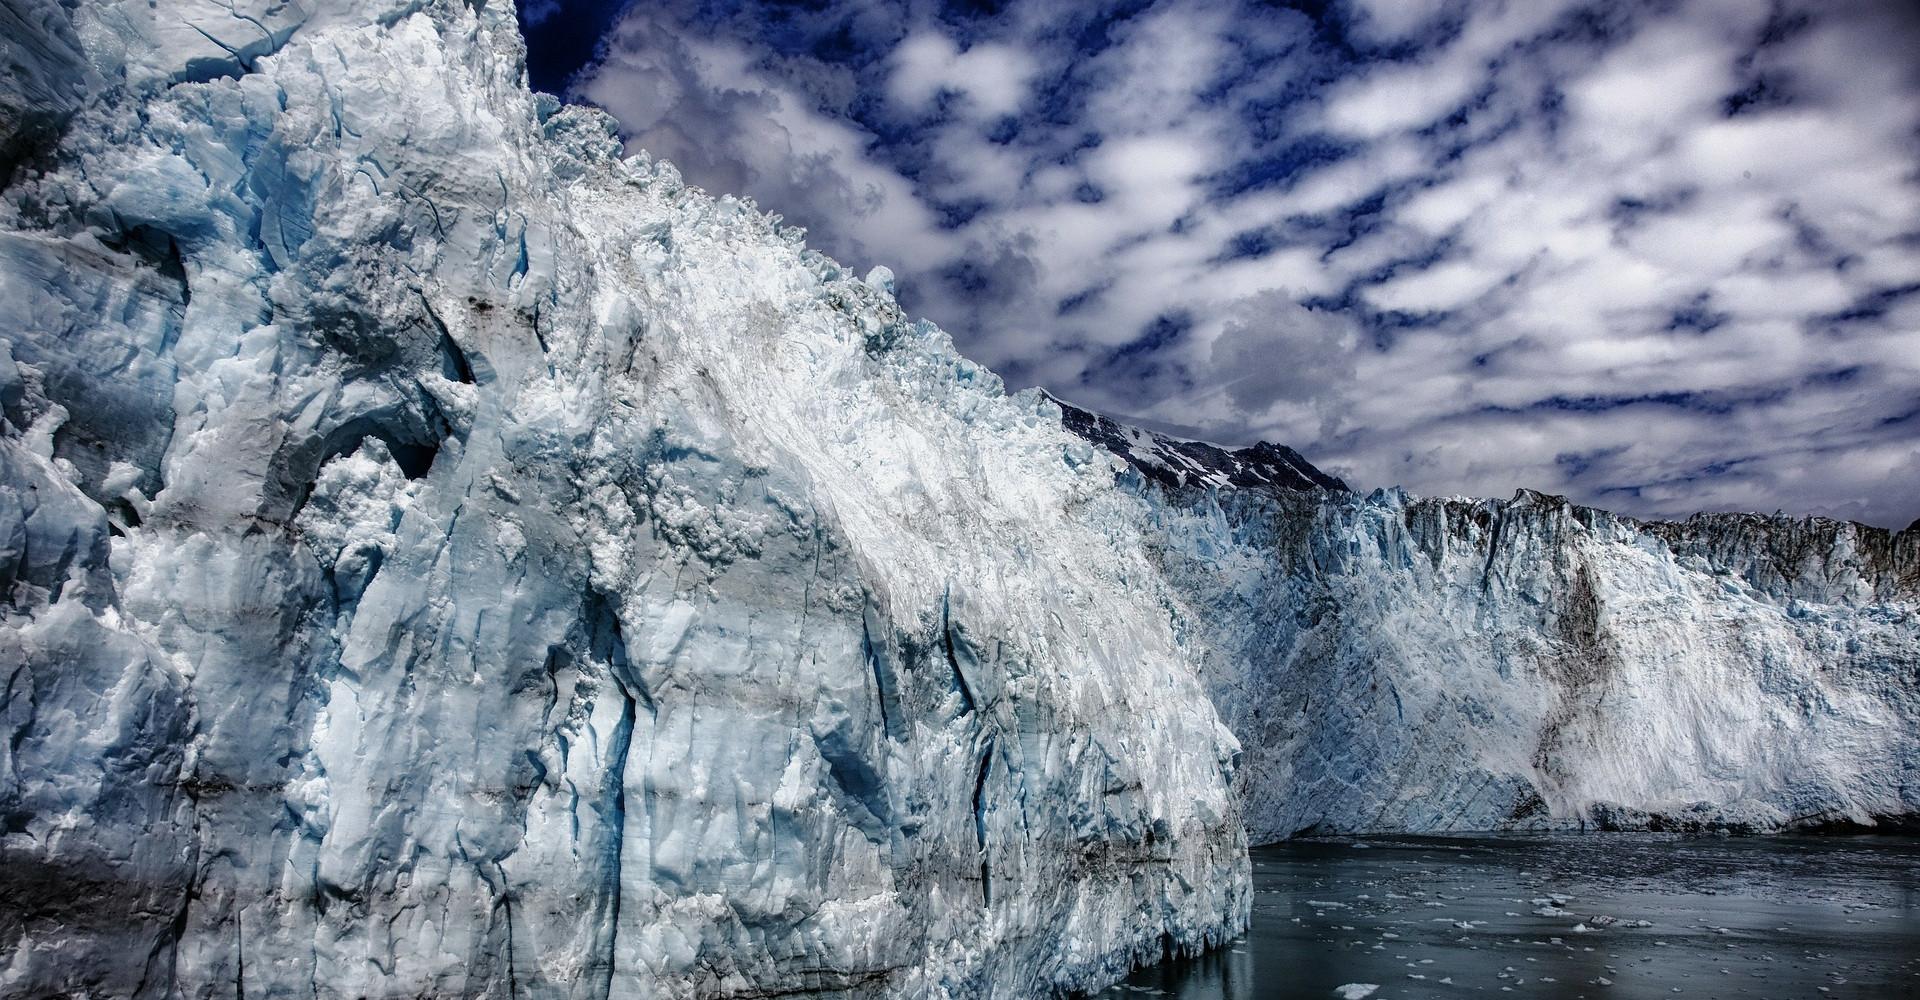 iceberg photography examples